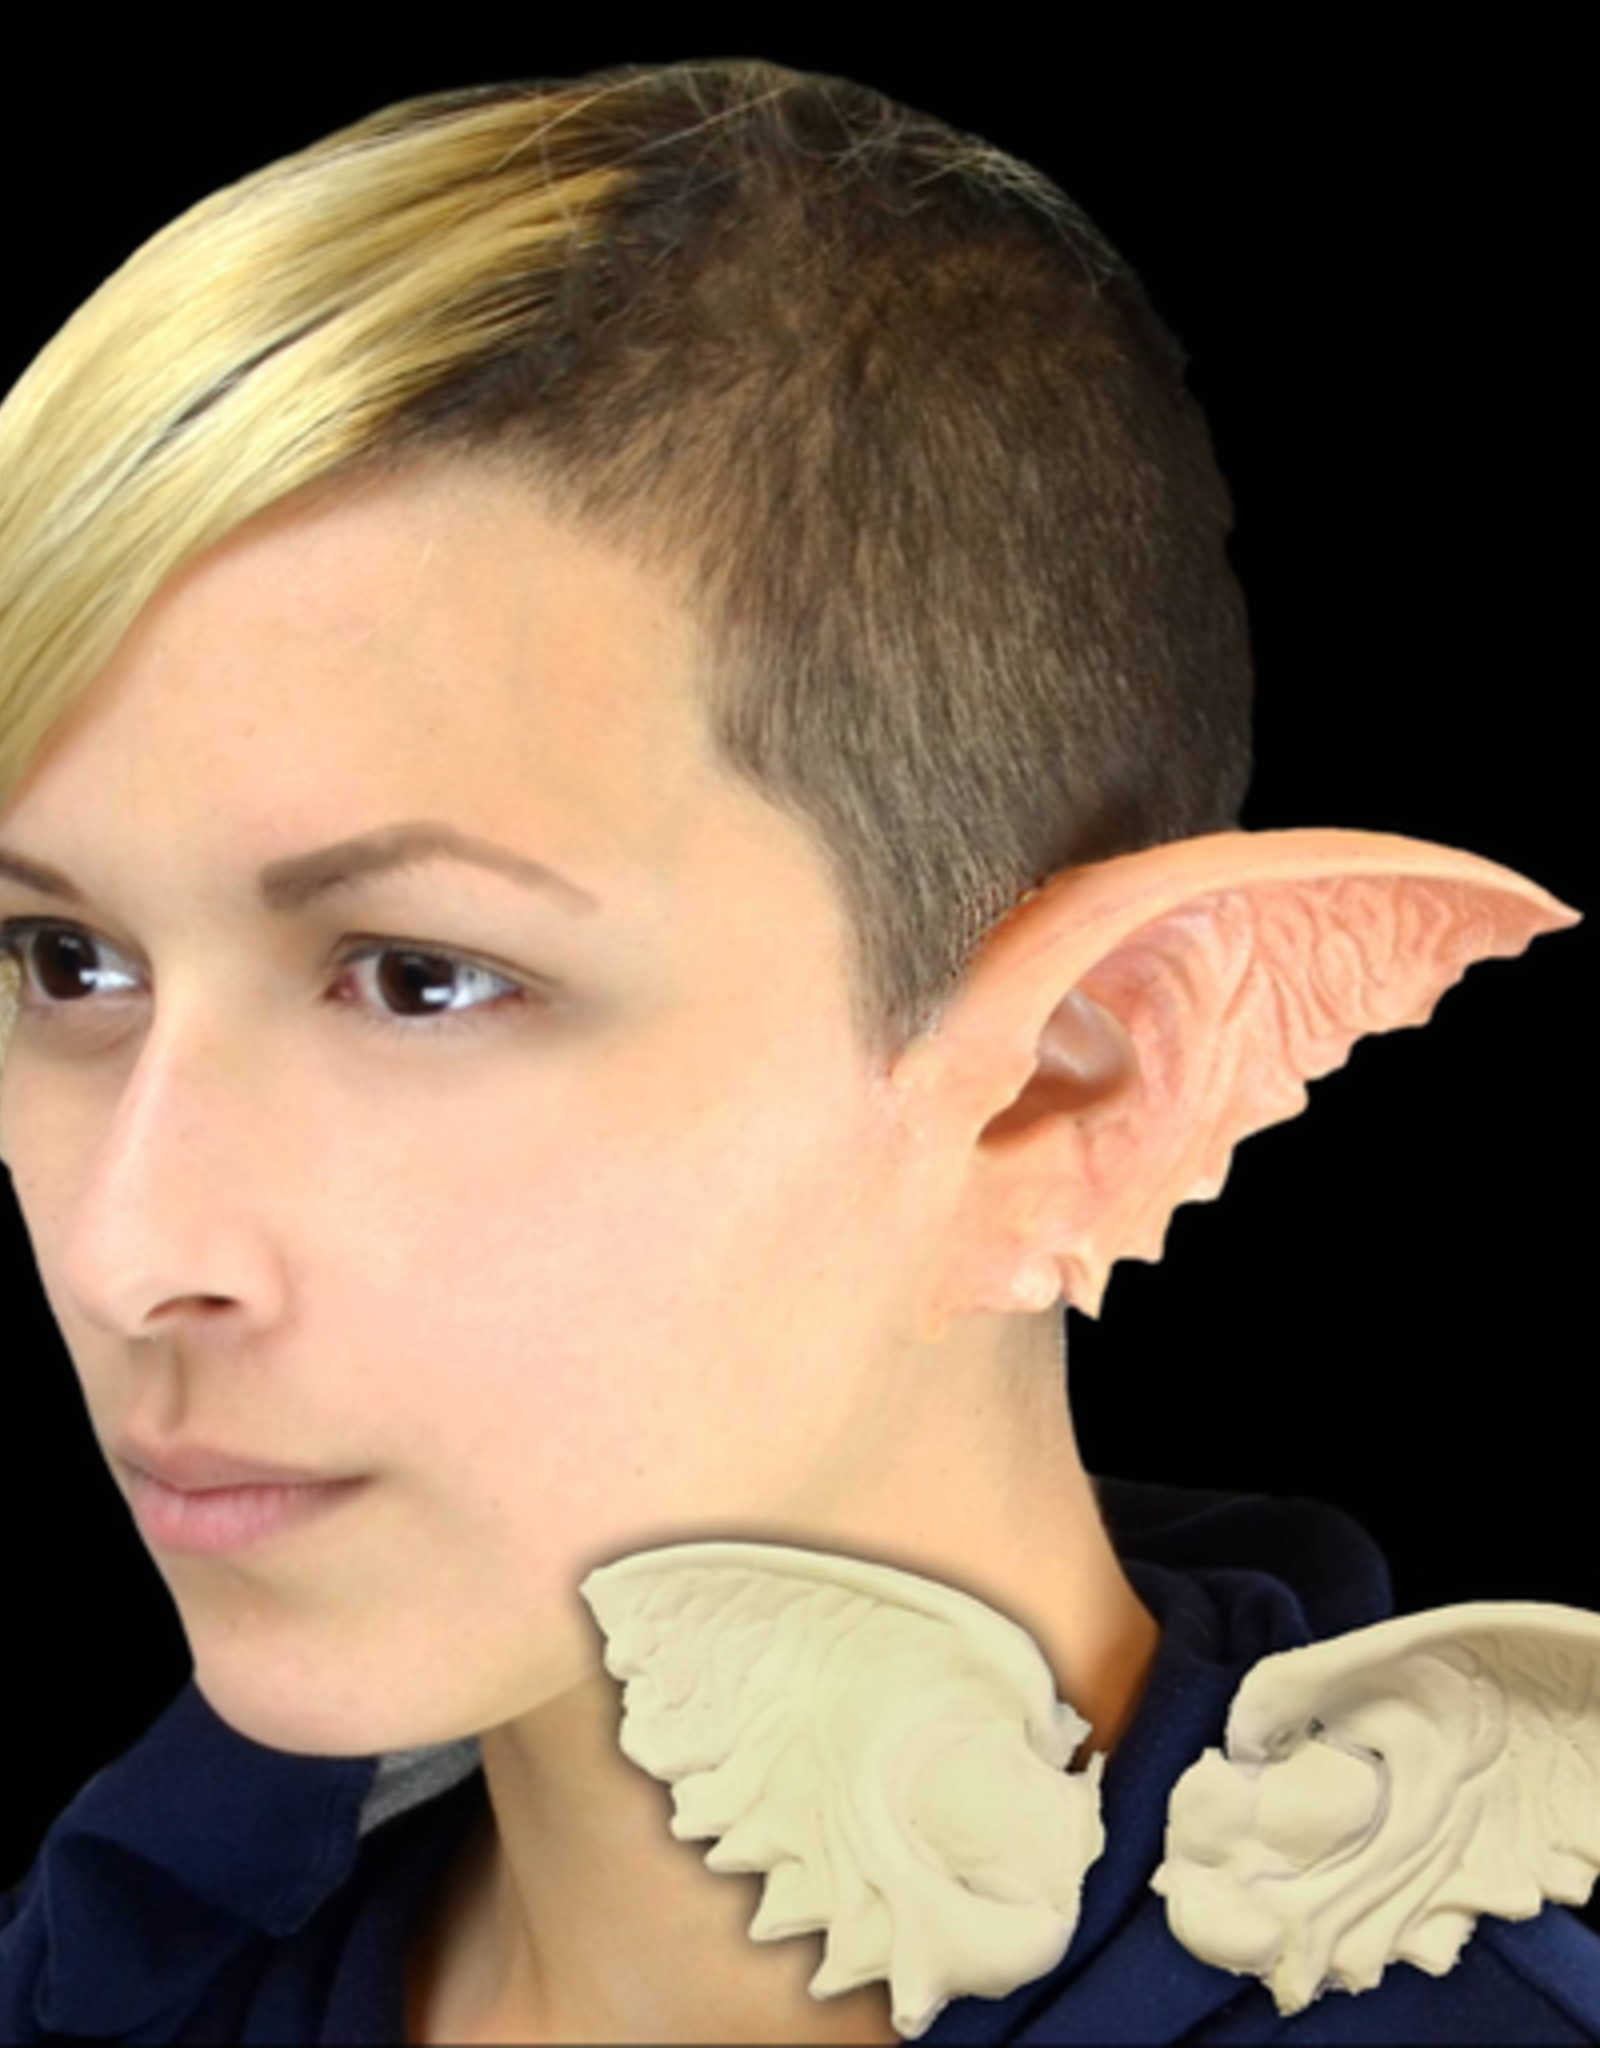 EARS-GREMLIN, LATEX